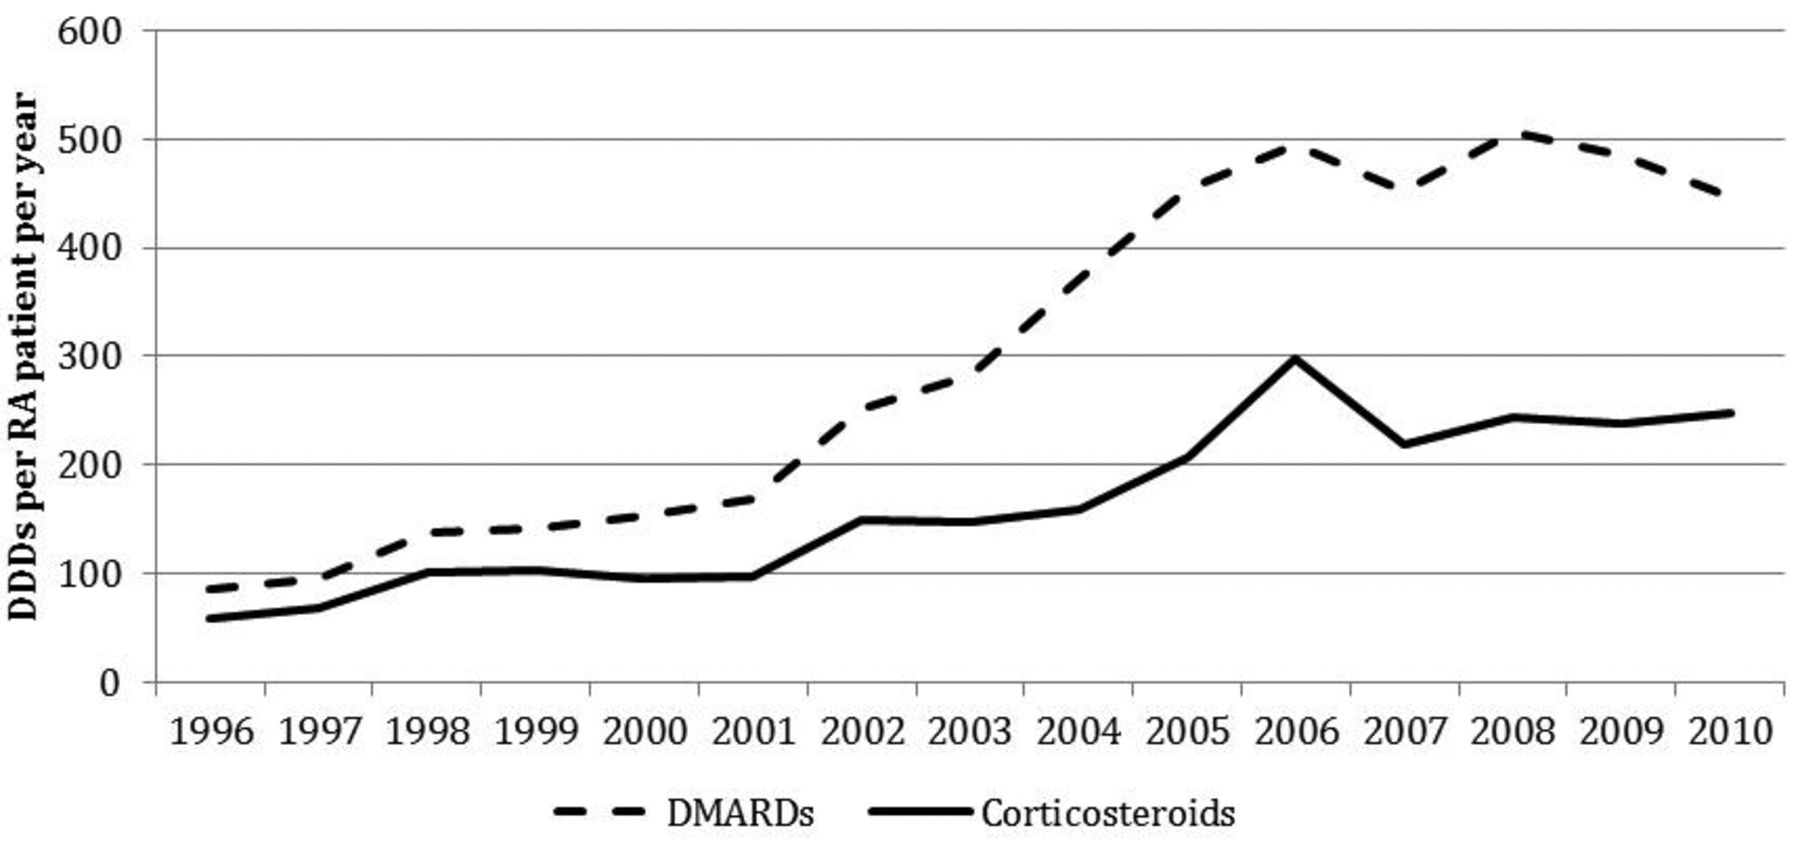 Rheumatoid Arthritis: Trends in Antirheumatic Drug Use, C-reactive